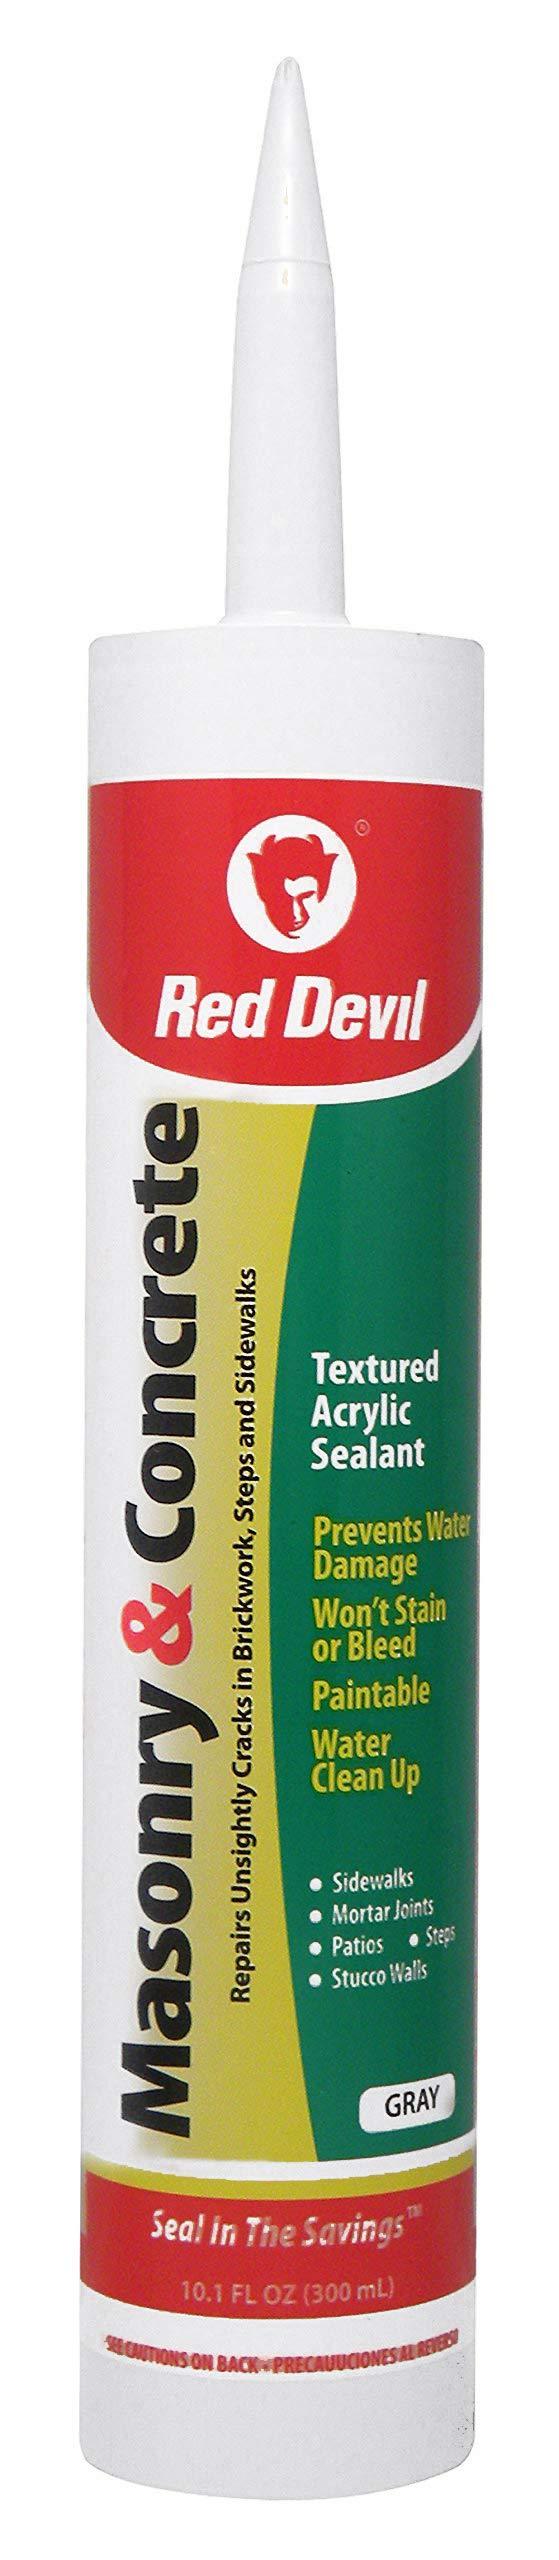 Red Devil 0646 Gray 10.1 Oz Cartridge Masonry and Concrete Acrylic Sealant Repair, 1 Pack